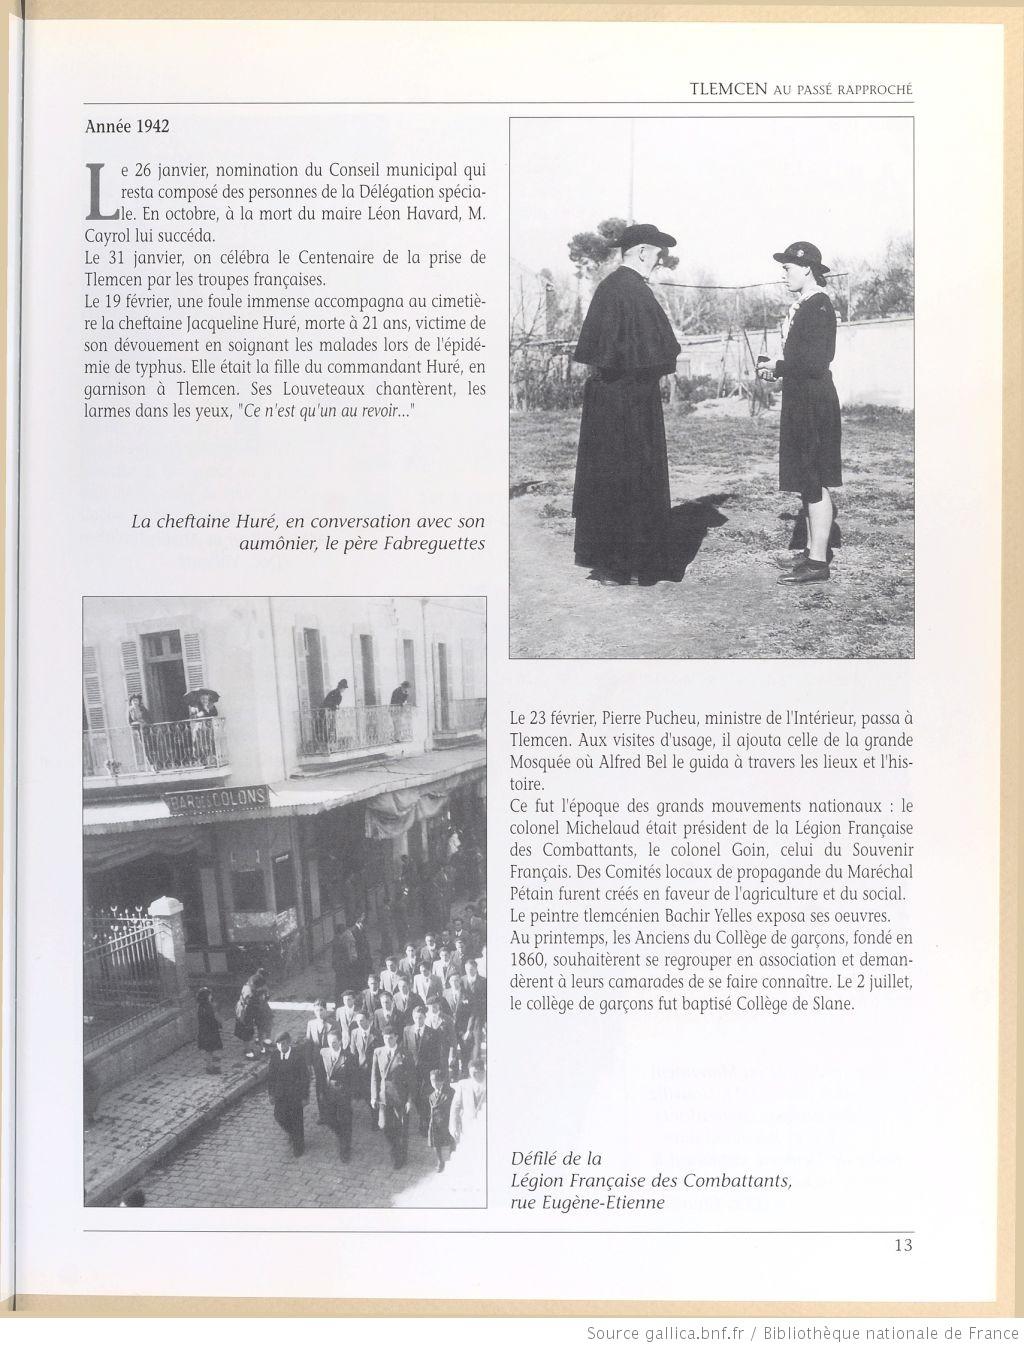 Tlemcen au passe rapproche 1942